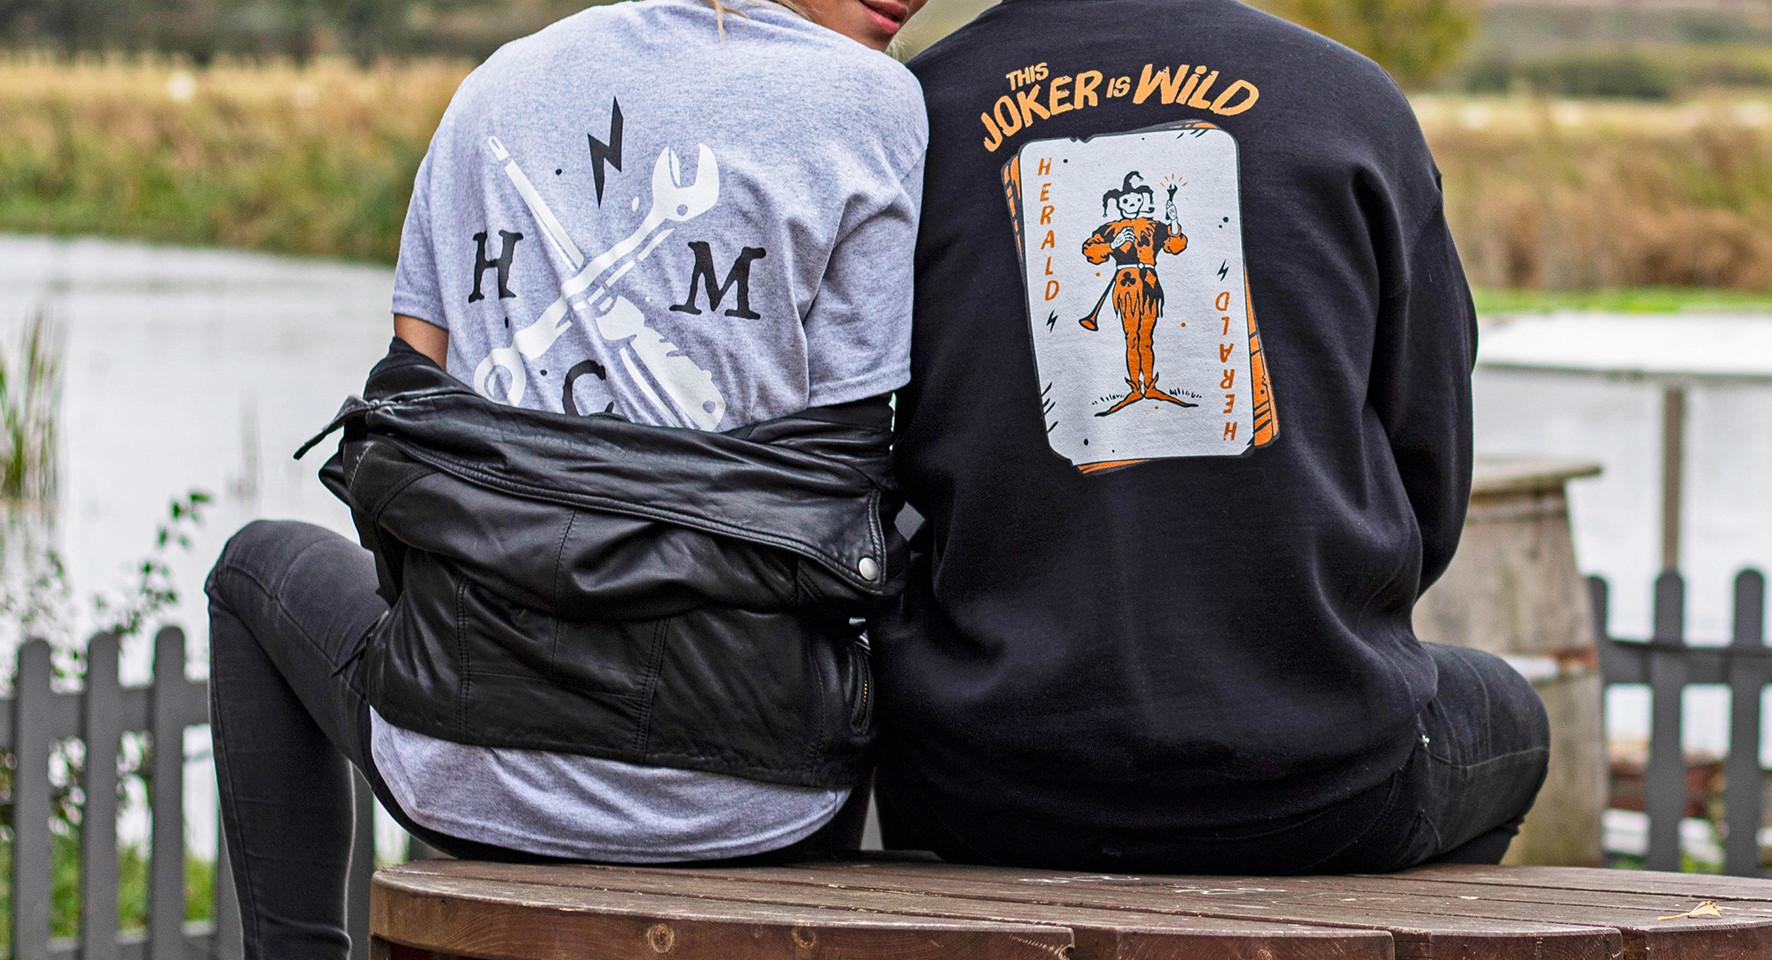 Herald Motor co. clothing